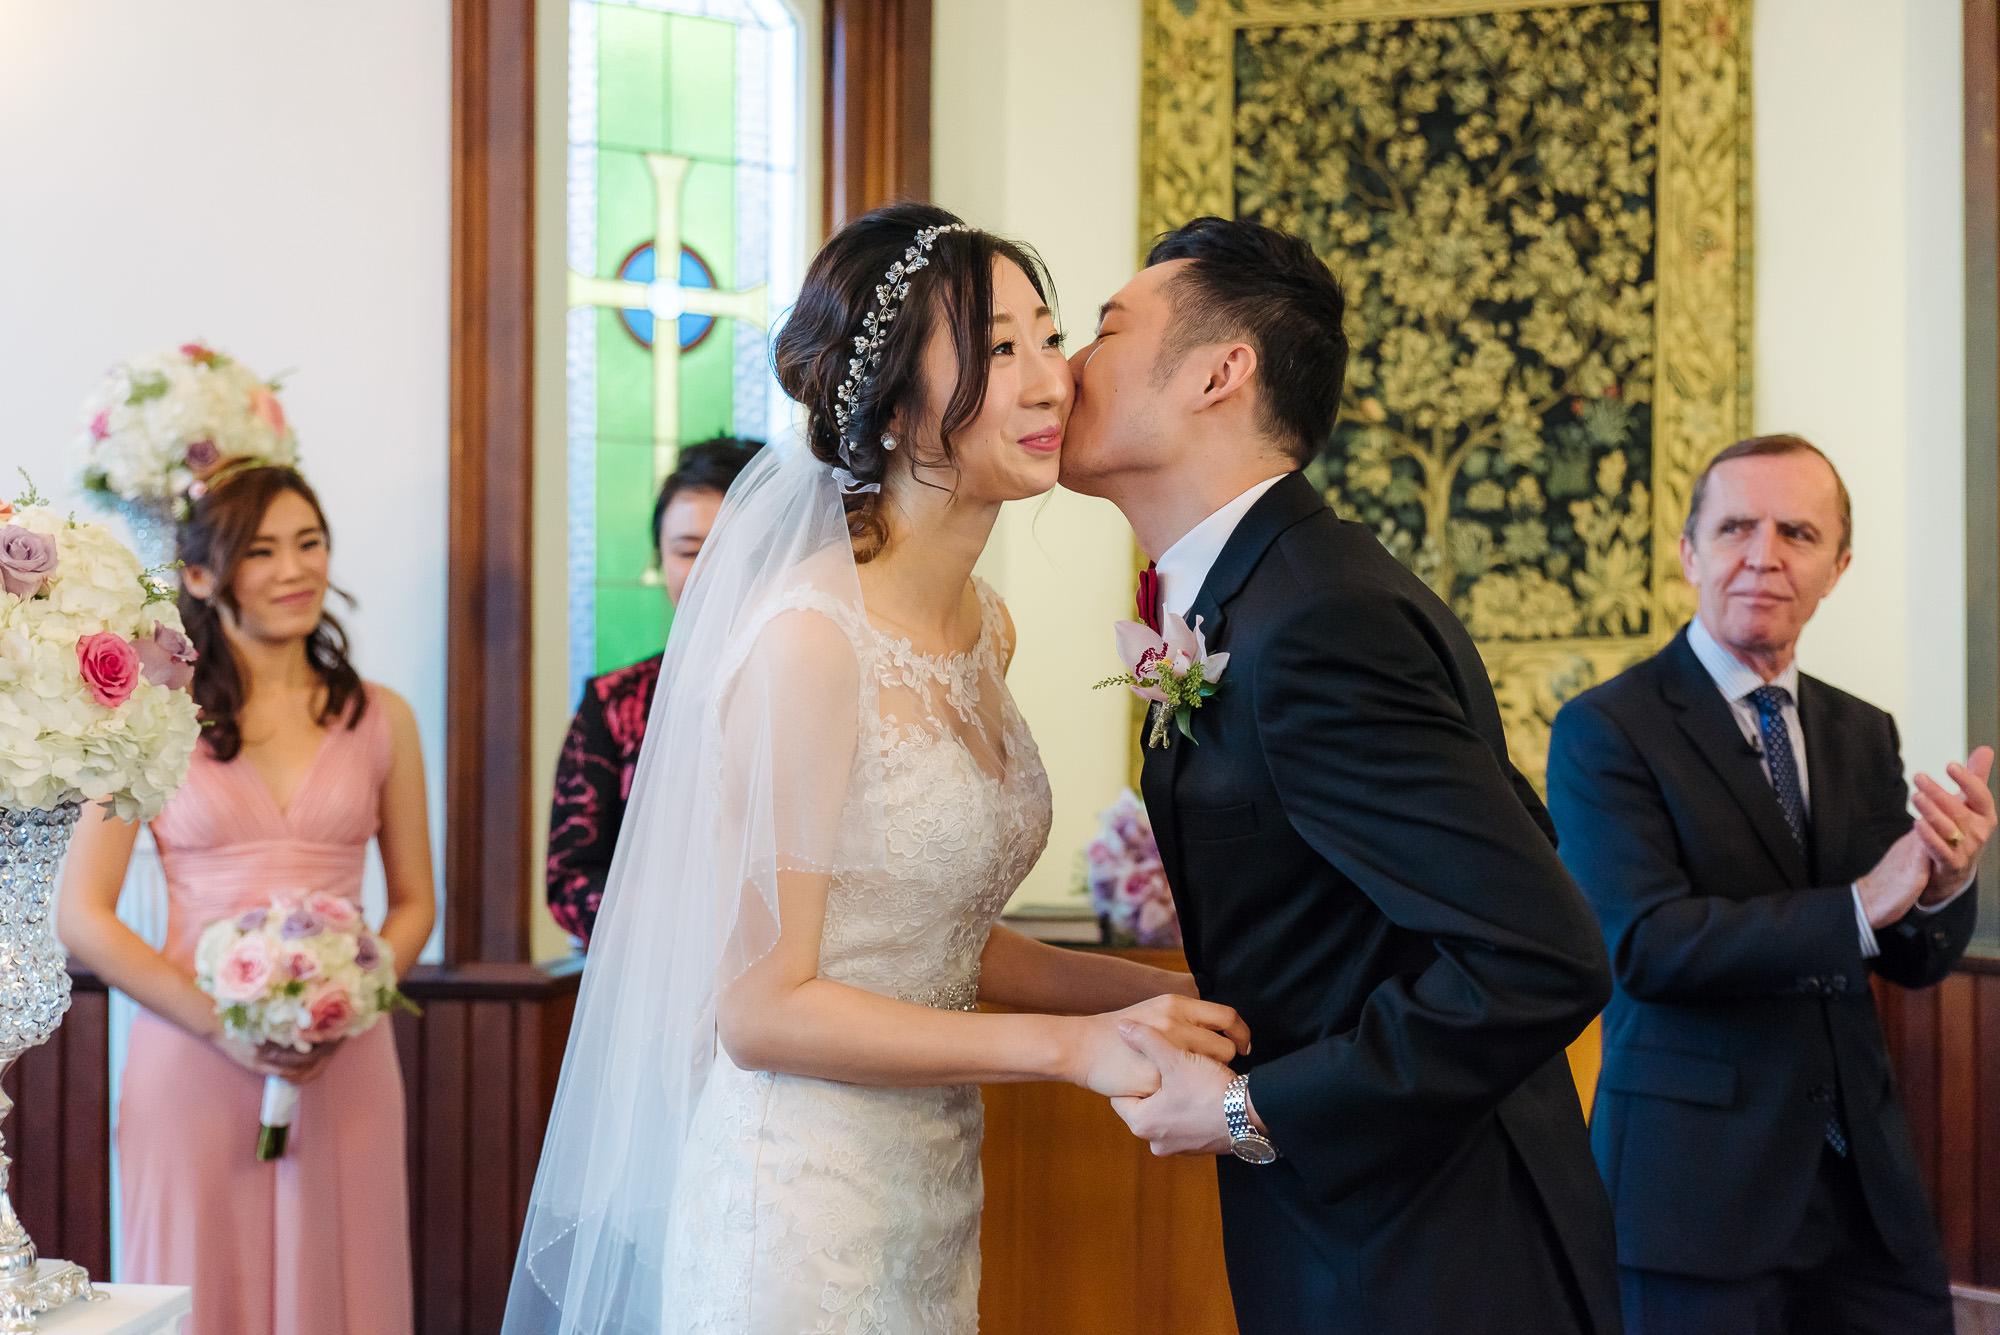 minoru_chapel_richmond_wedding_ceremony 16210911.jpg